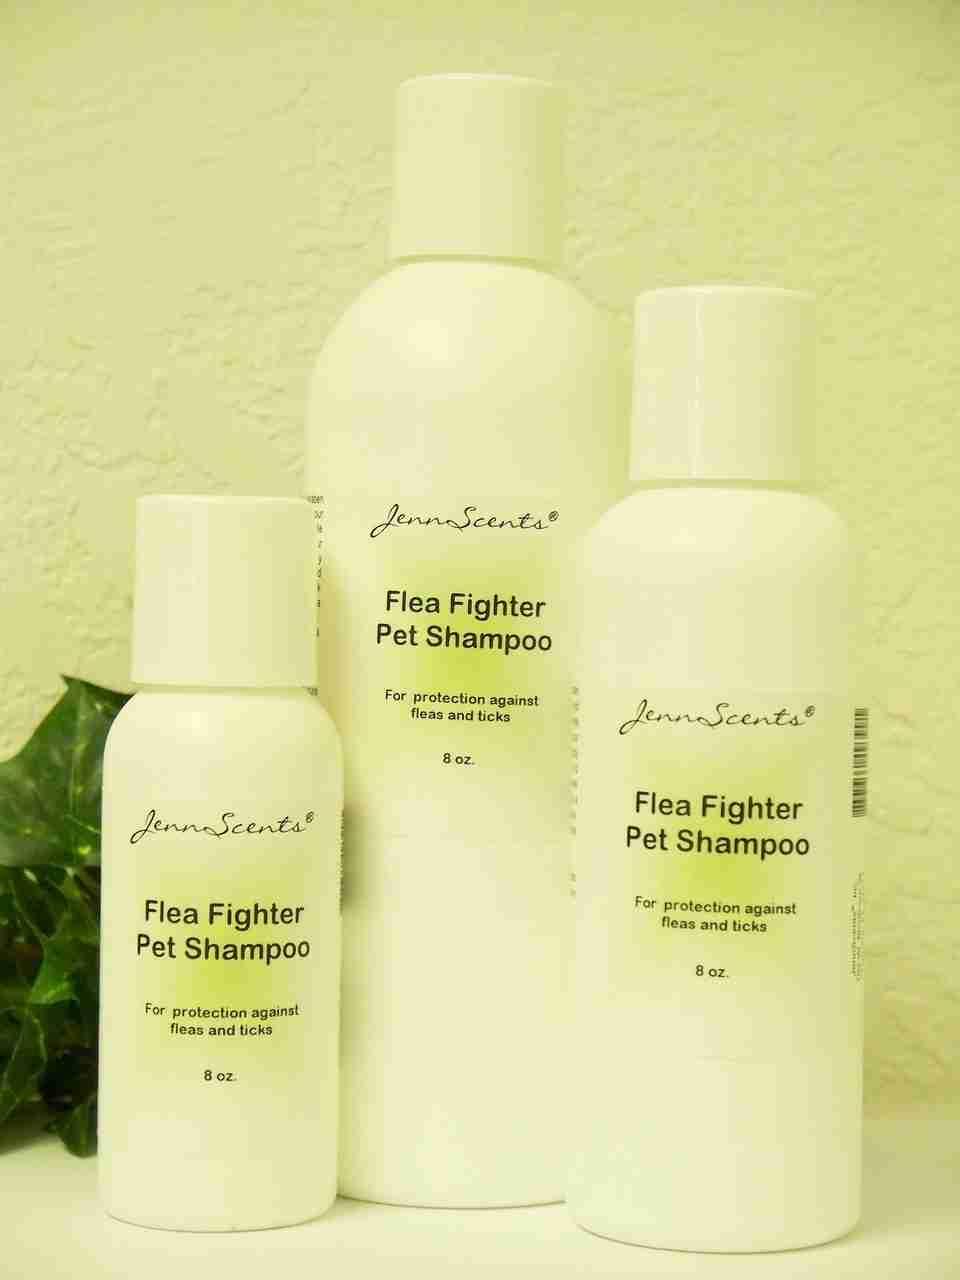 Flea Fighter Shampoo